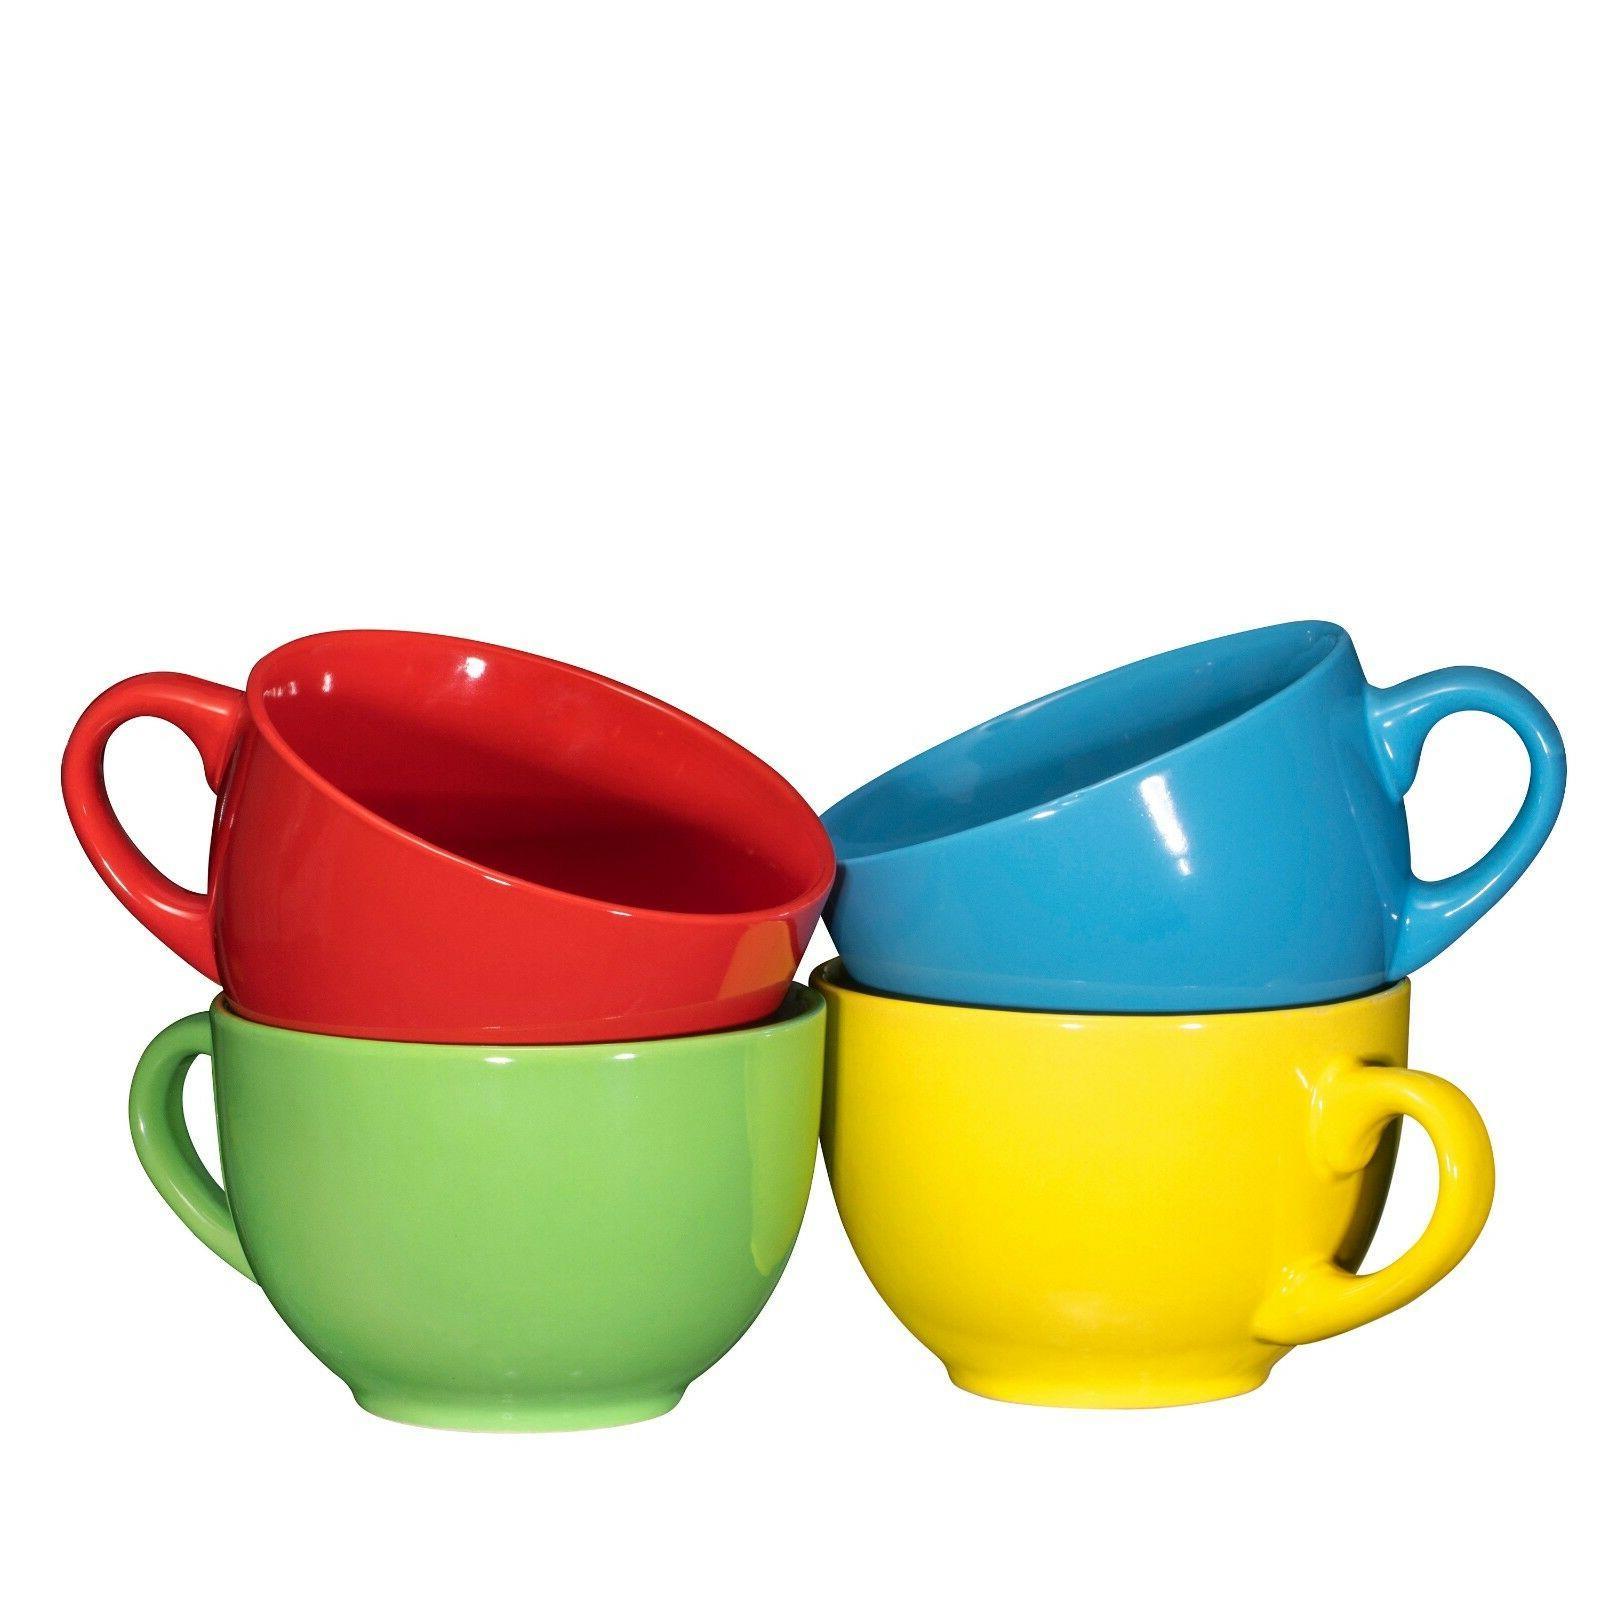 Bruntmor Ceramic Coffee Mug 24